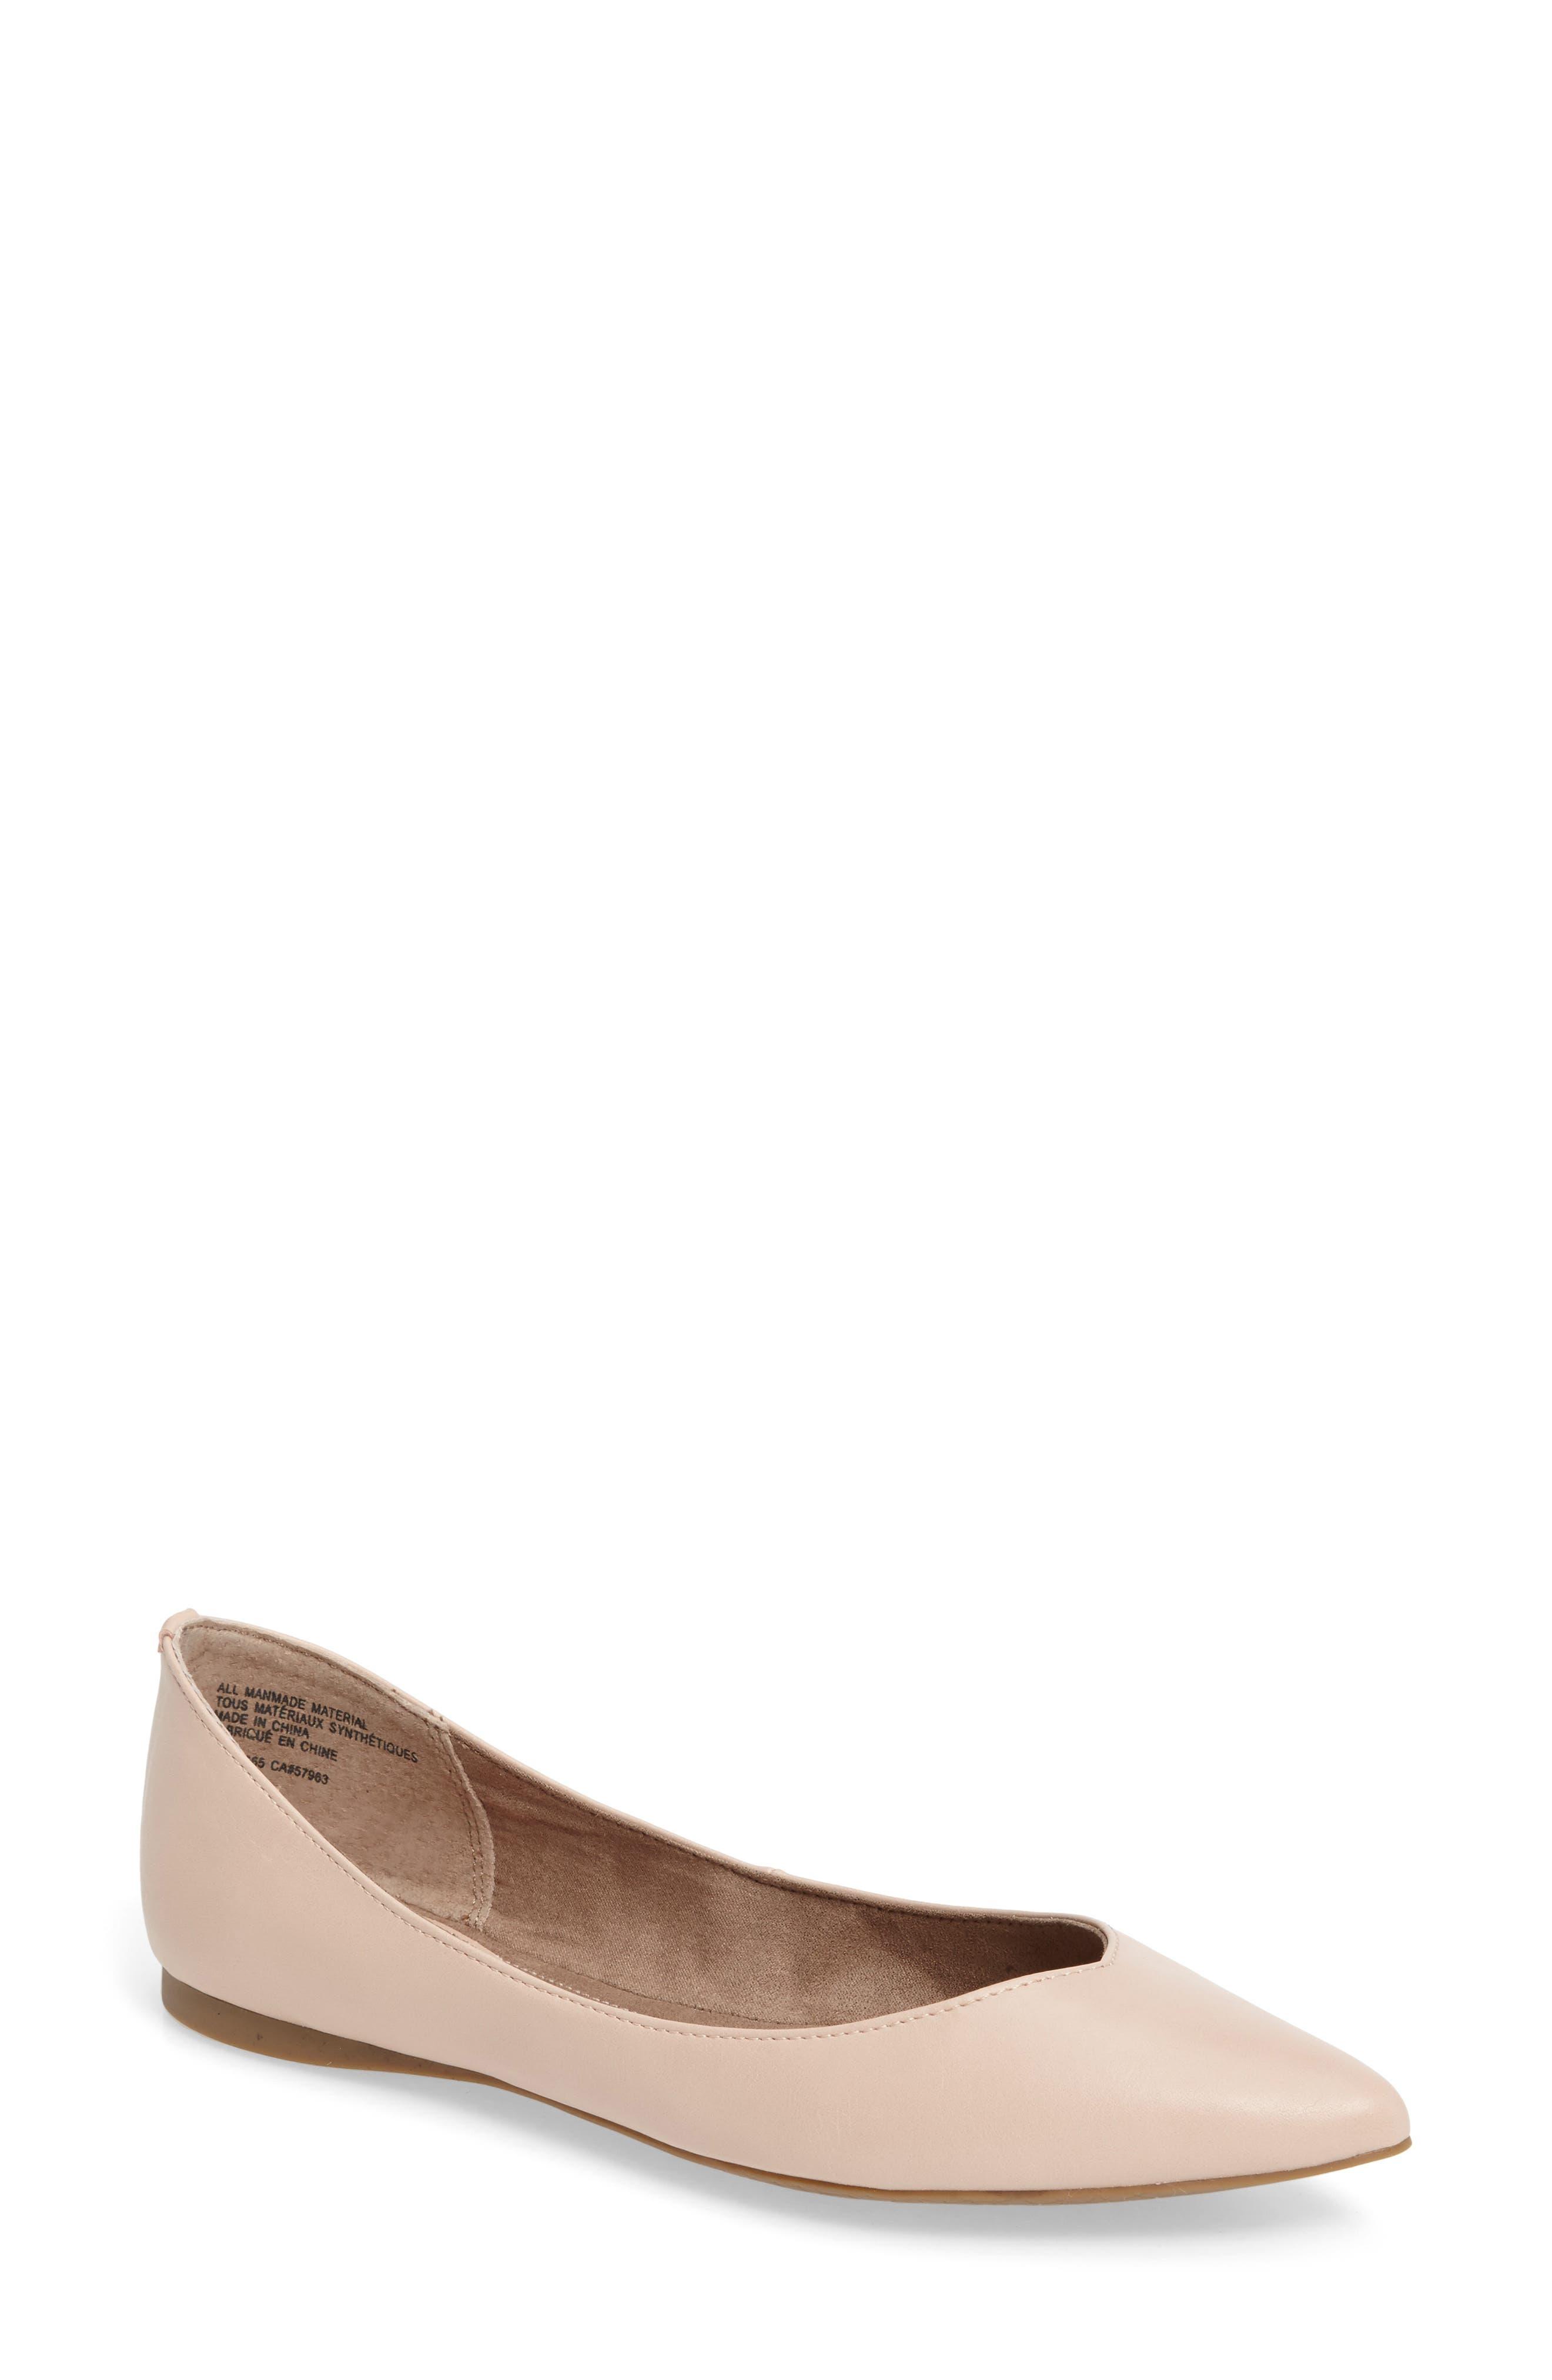 Main Image - BP. 'Moveover' Pointy Toe Flat (Women)